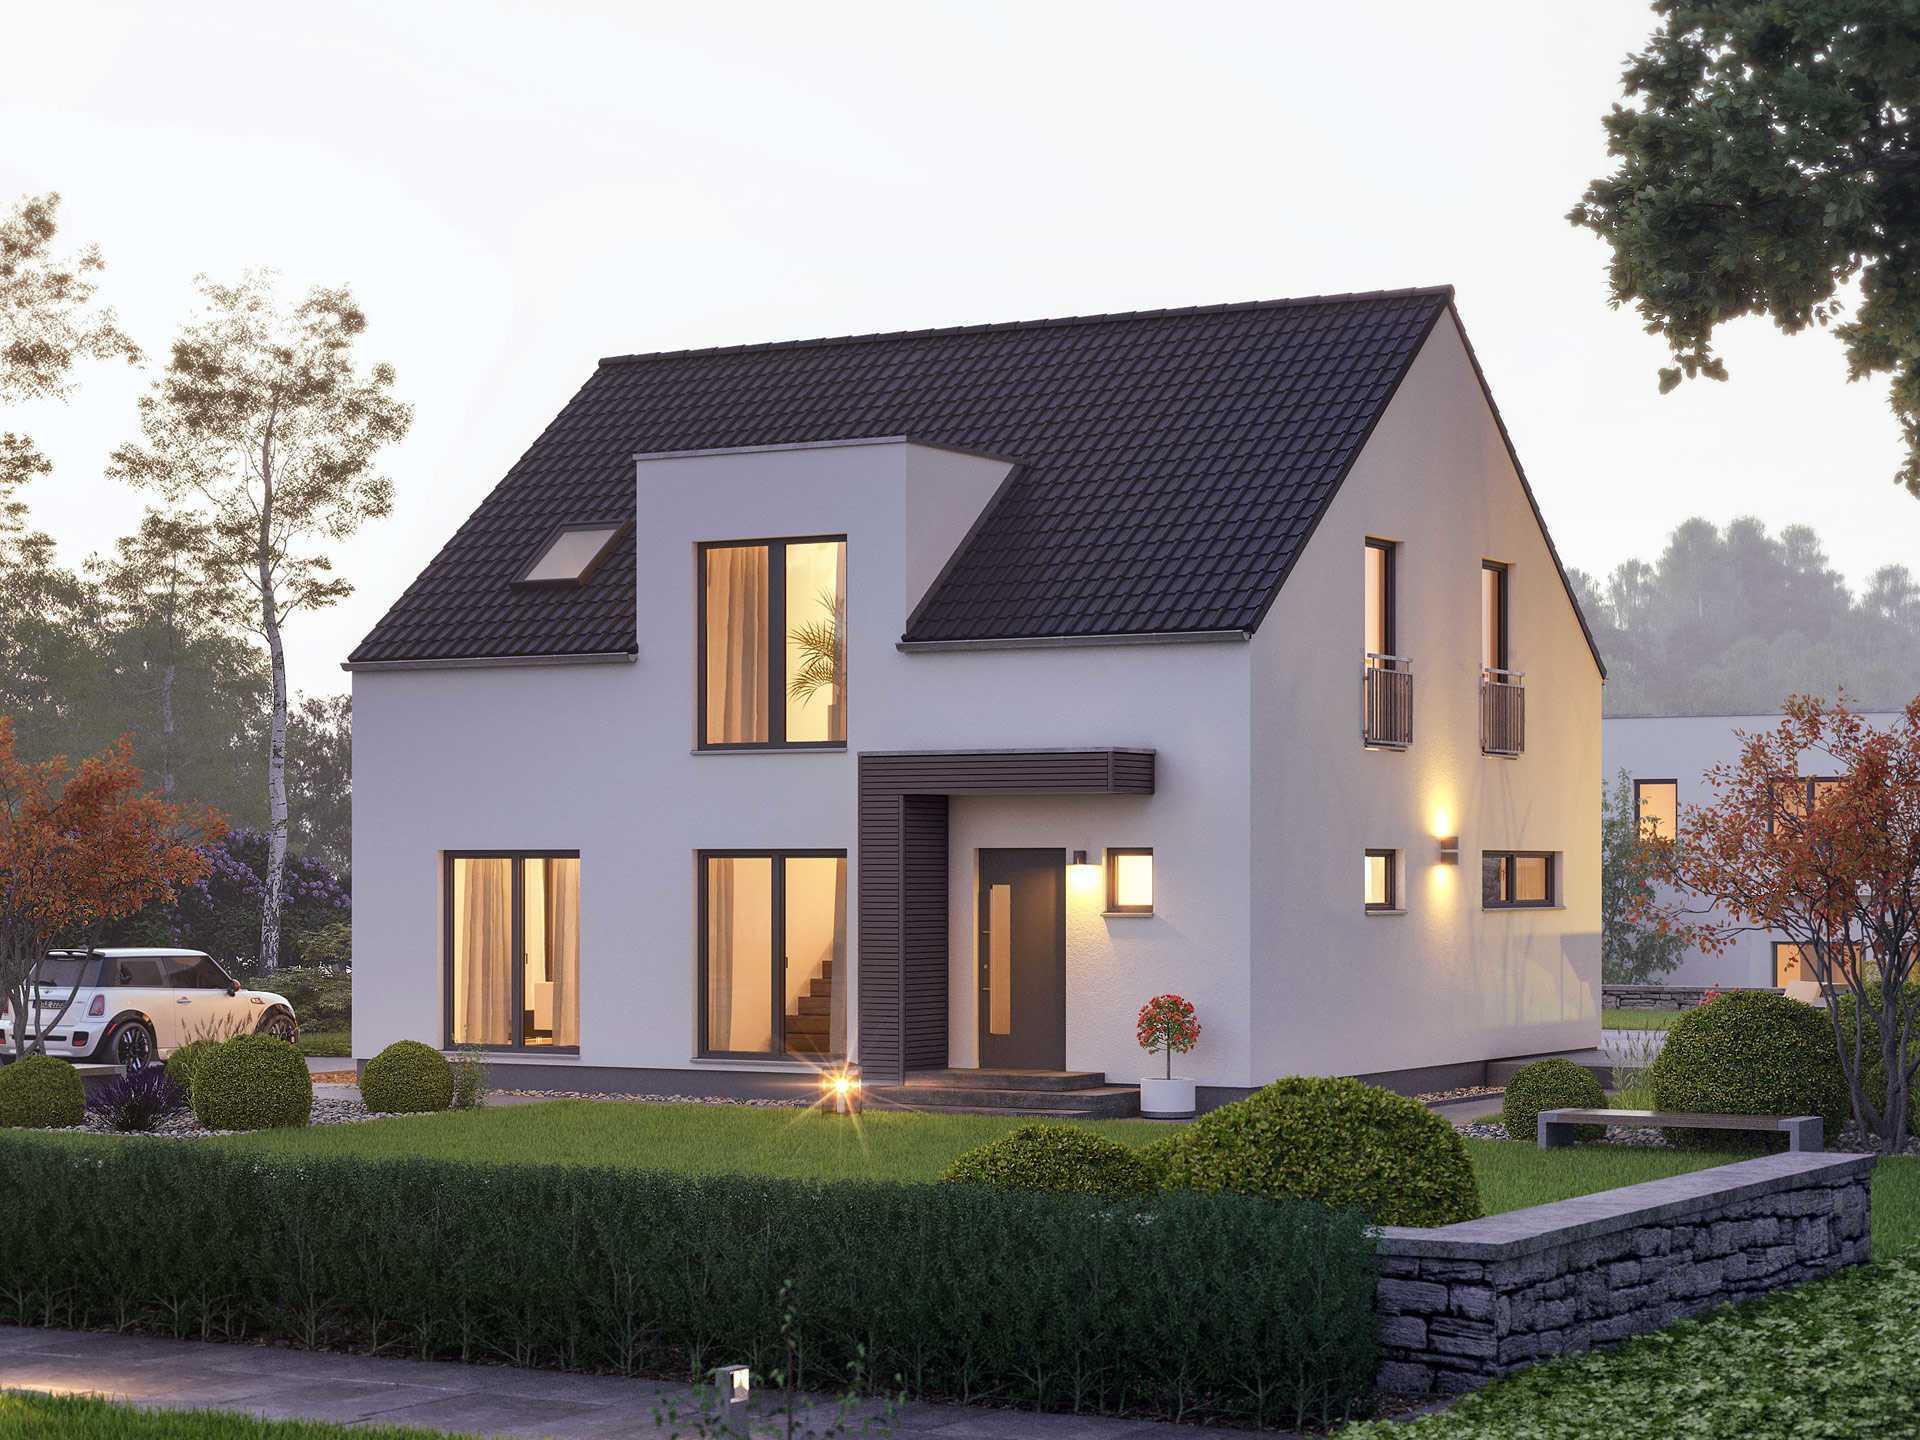 einfamilienhaus pure 5 massa haus. Black Bedroom Furniture Sets. Home Design Ideas